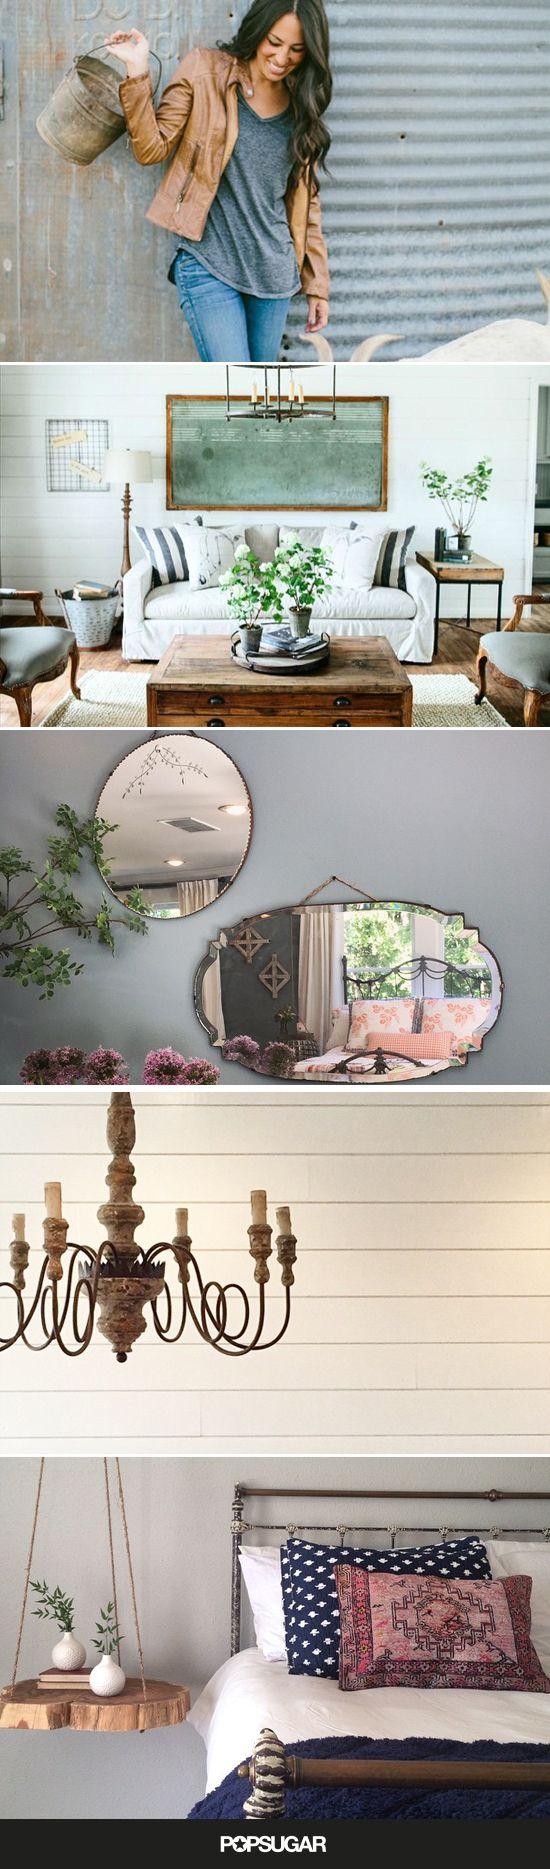 Decorating like joanna gaines - 22 Farm Tastic Decorating Ideas Inspired By Hgtv Host Joanna Gaines